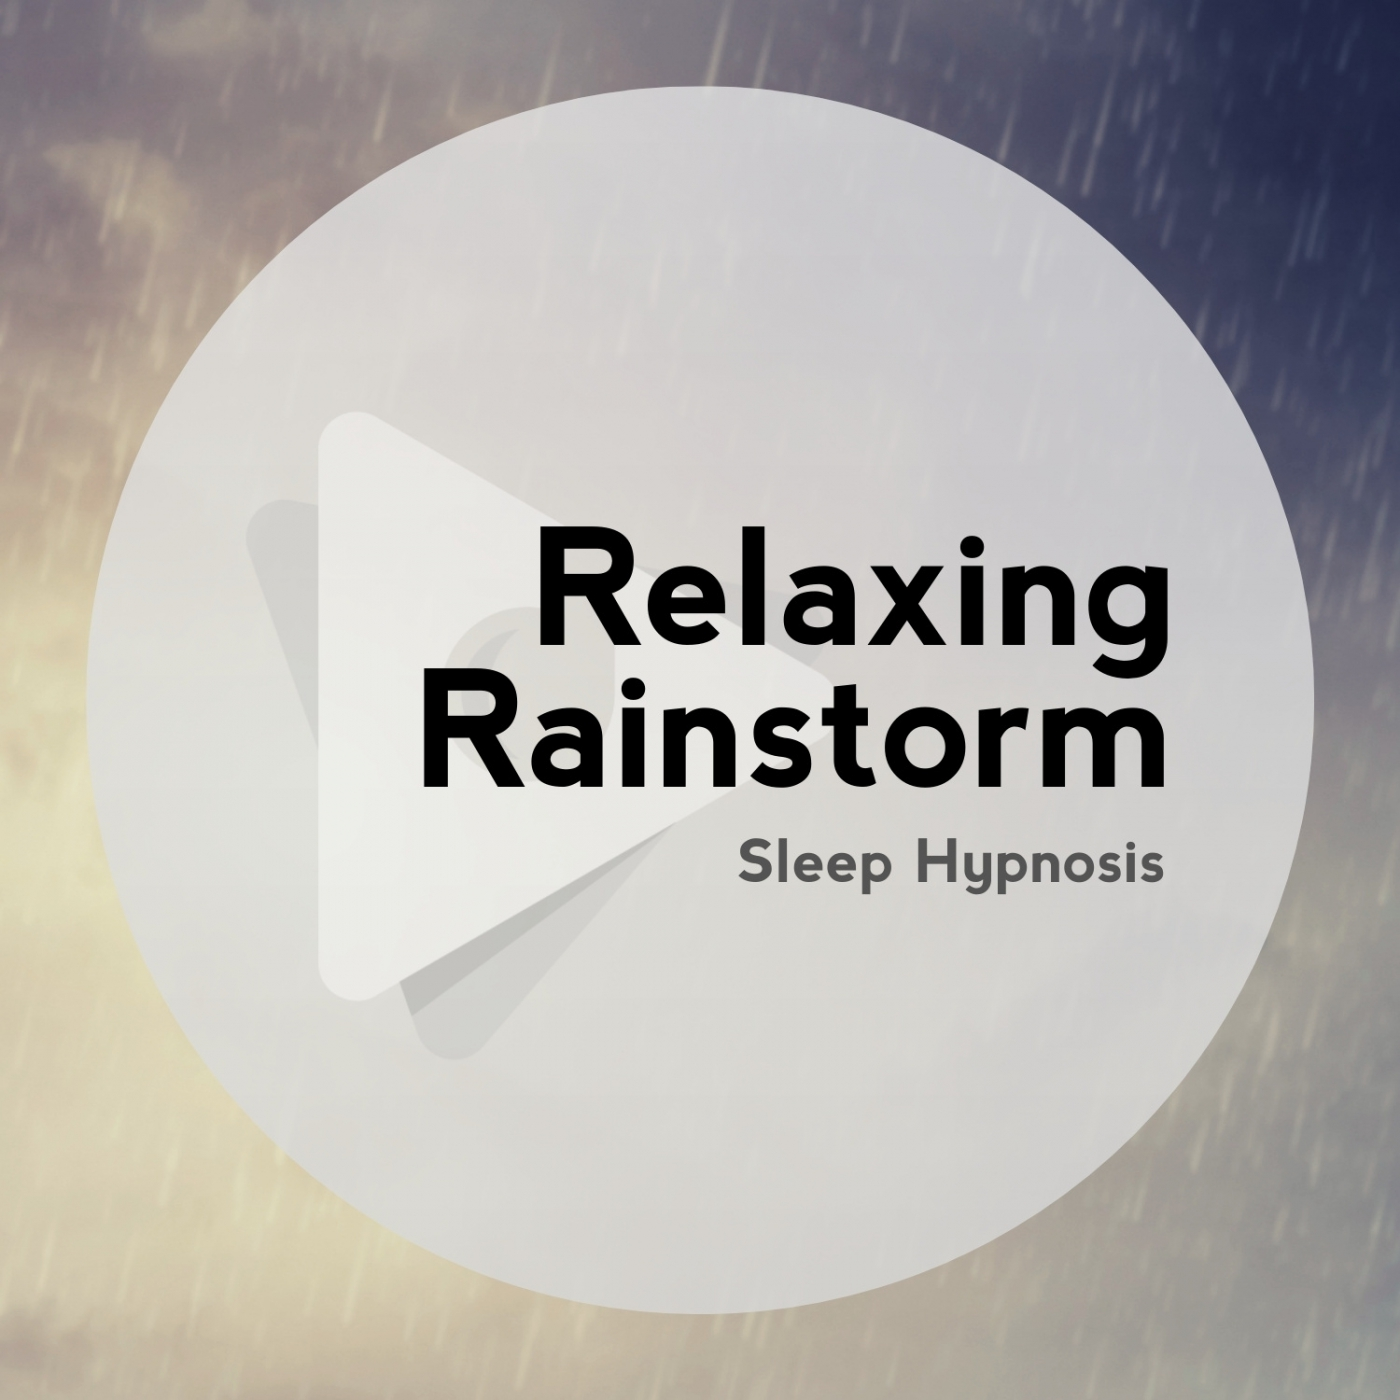 Relaxing Rainstorm